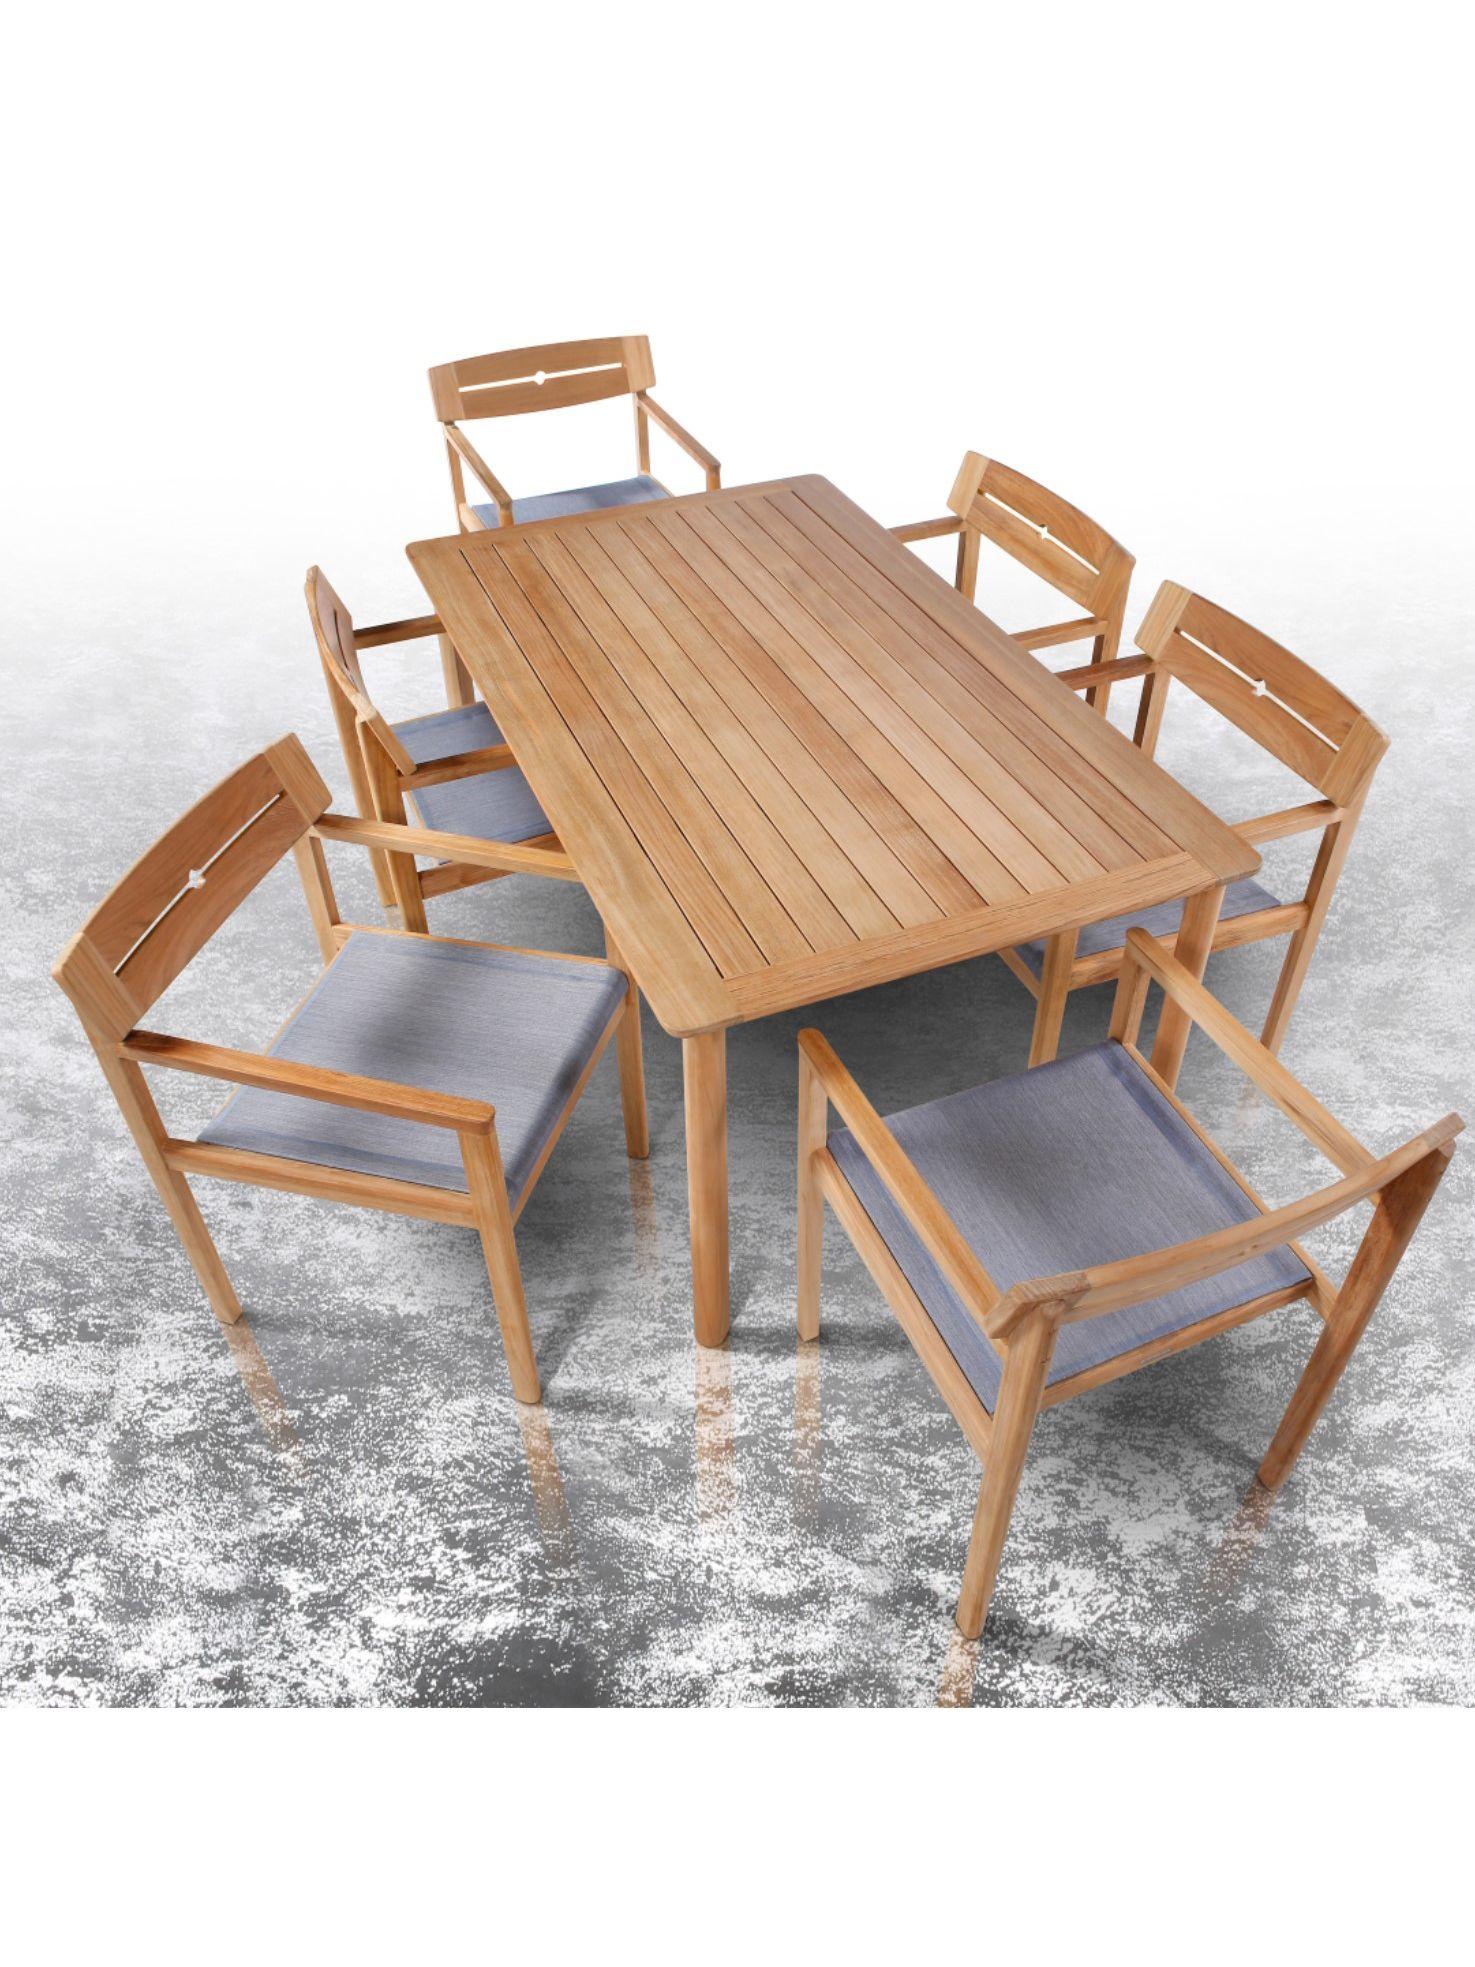 Barlow Tyrie Atom 9 Seat Teak Wood Garden Dining Table & Chairs Set,  Natural/Denim